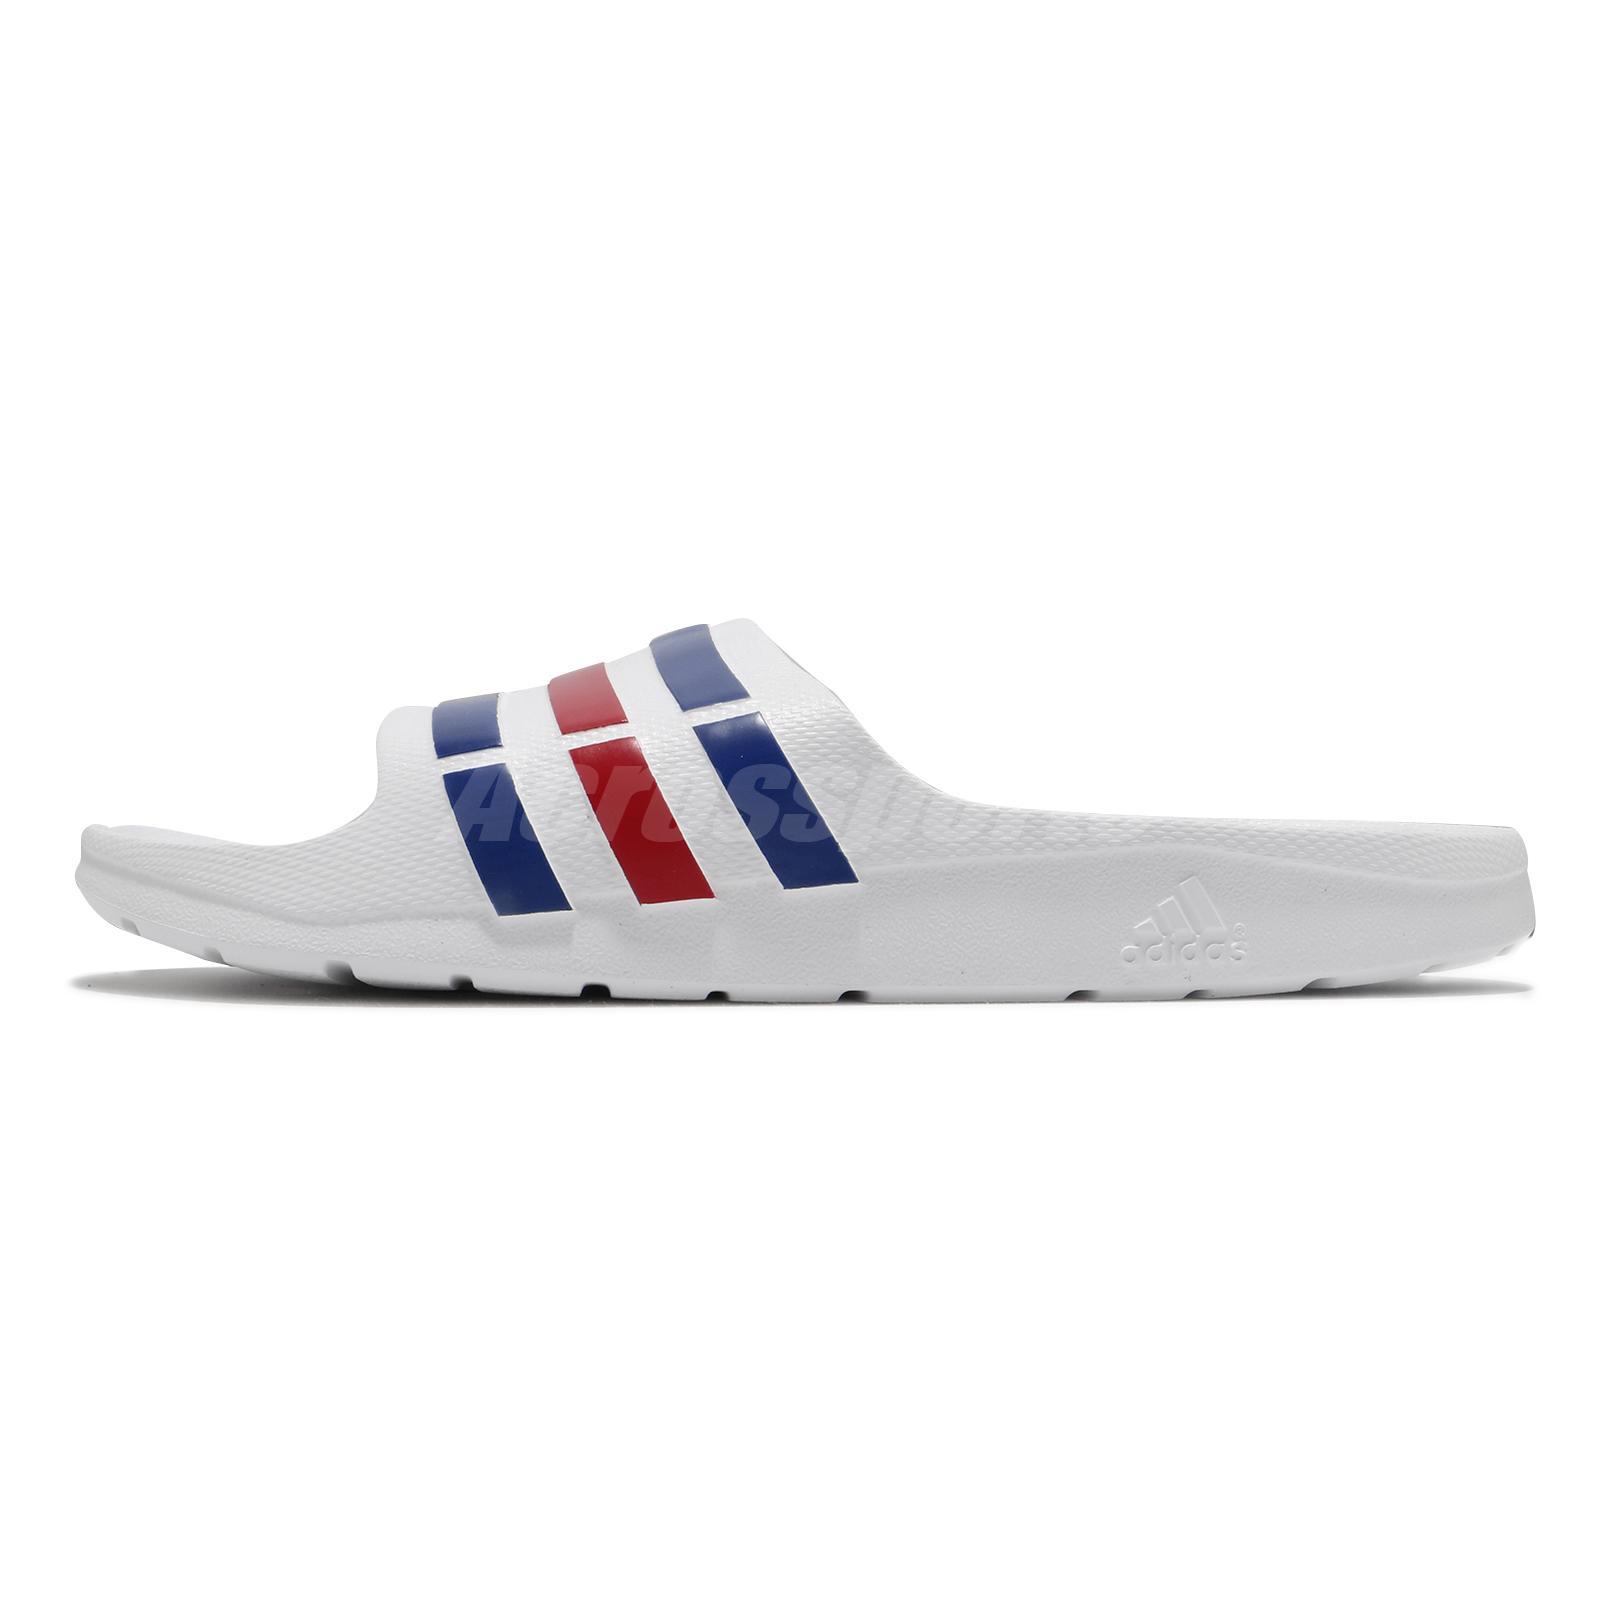 191d578f adidas Duramo Slide White Blue Red Mens Womens Sports Slide Slippers ...